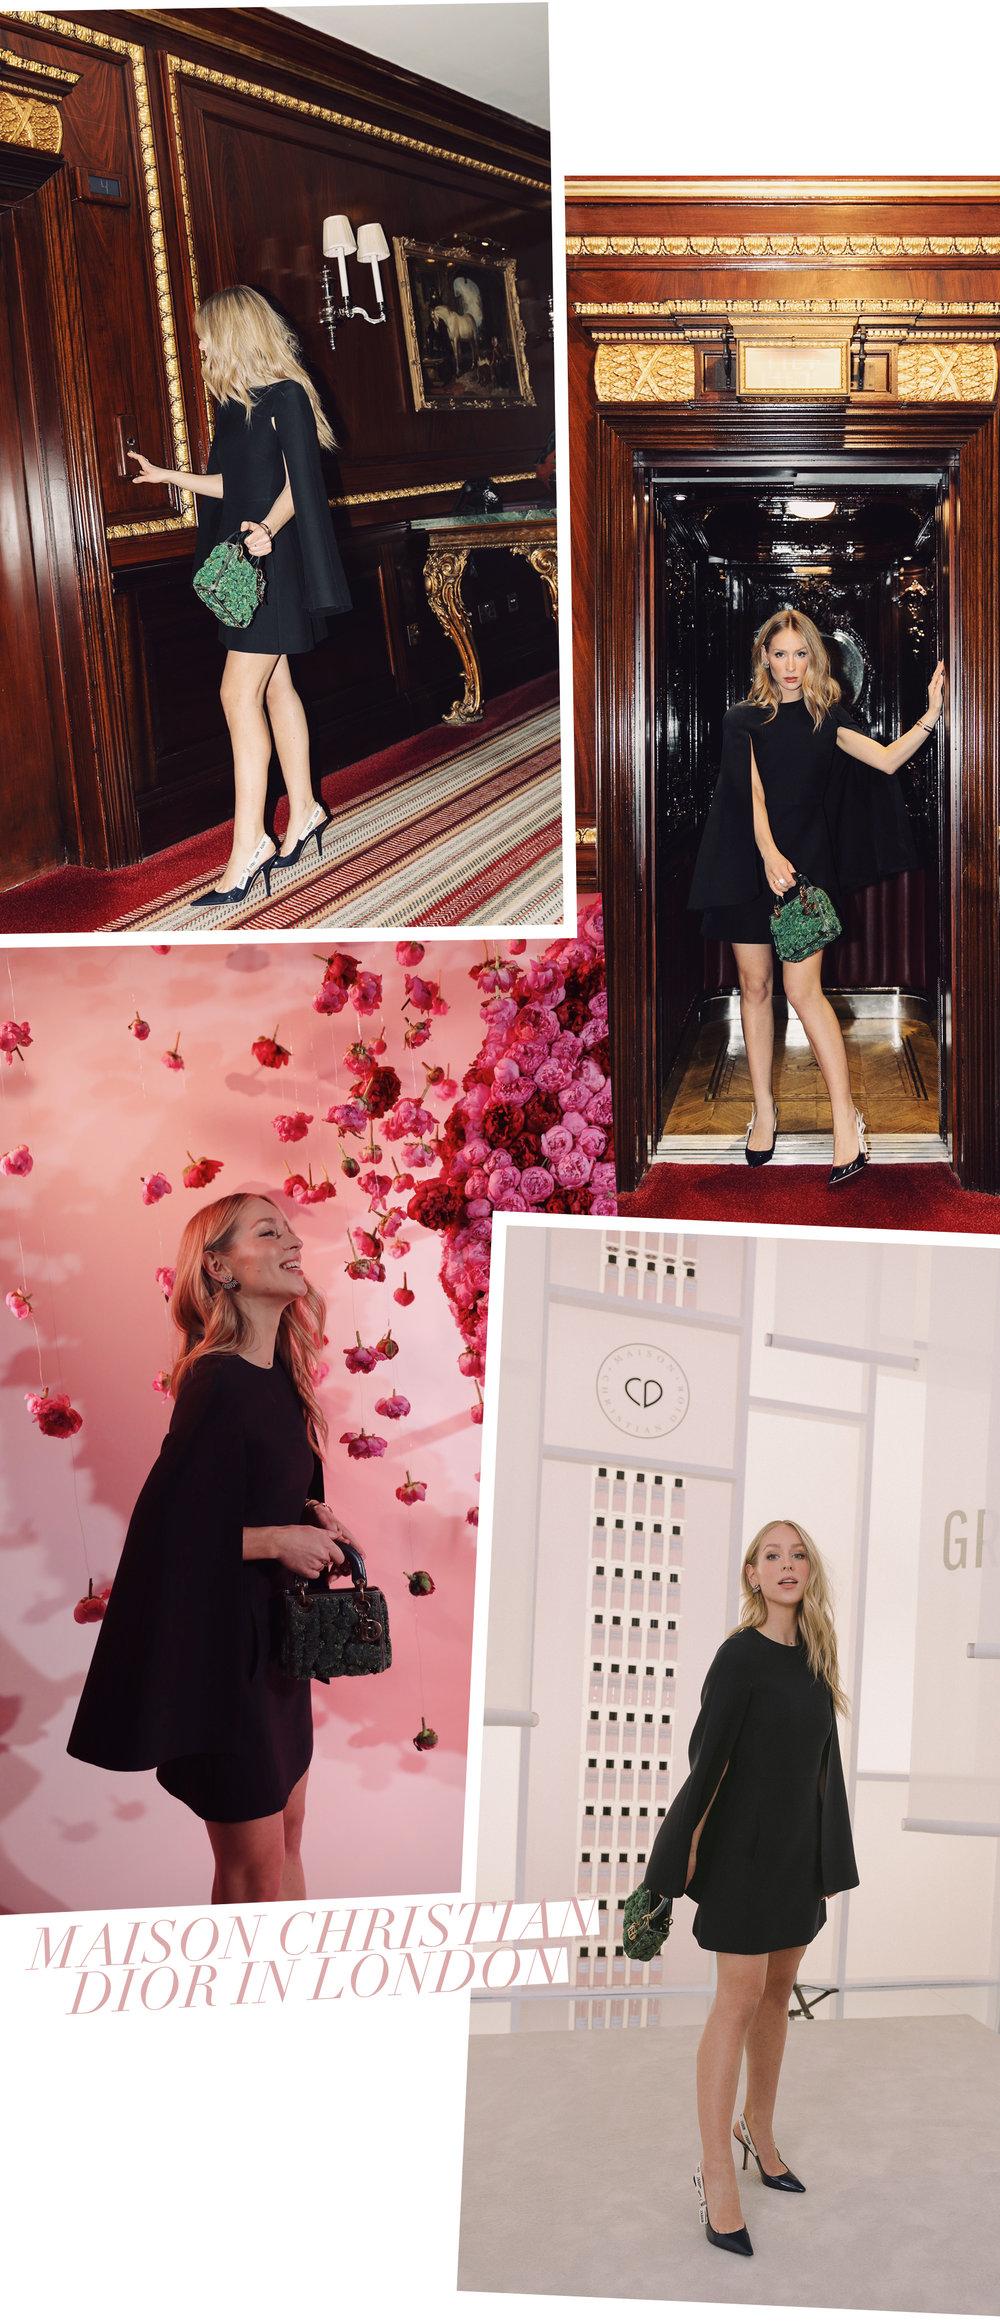 Dior_London_Carin_Olsson_05